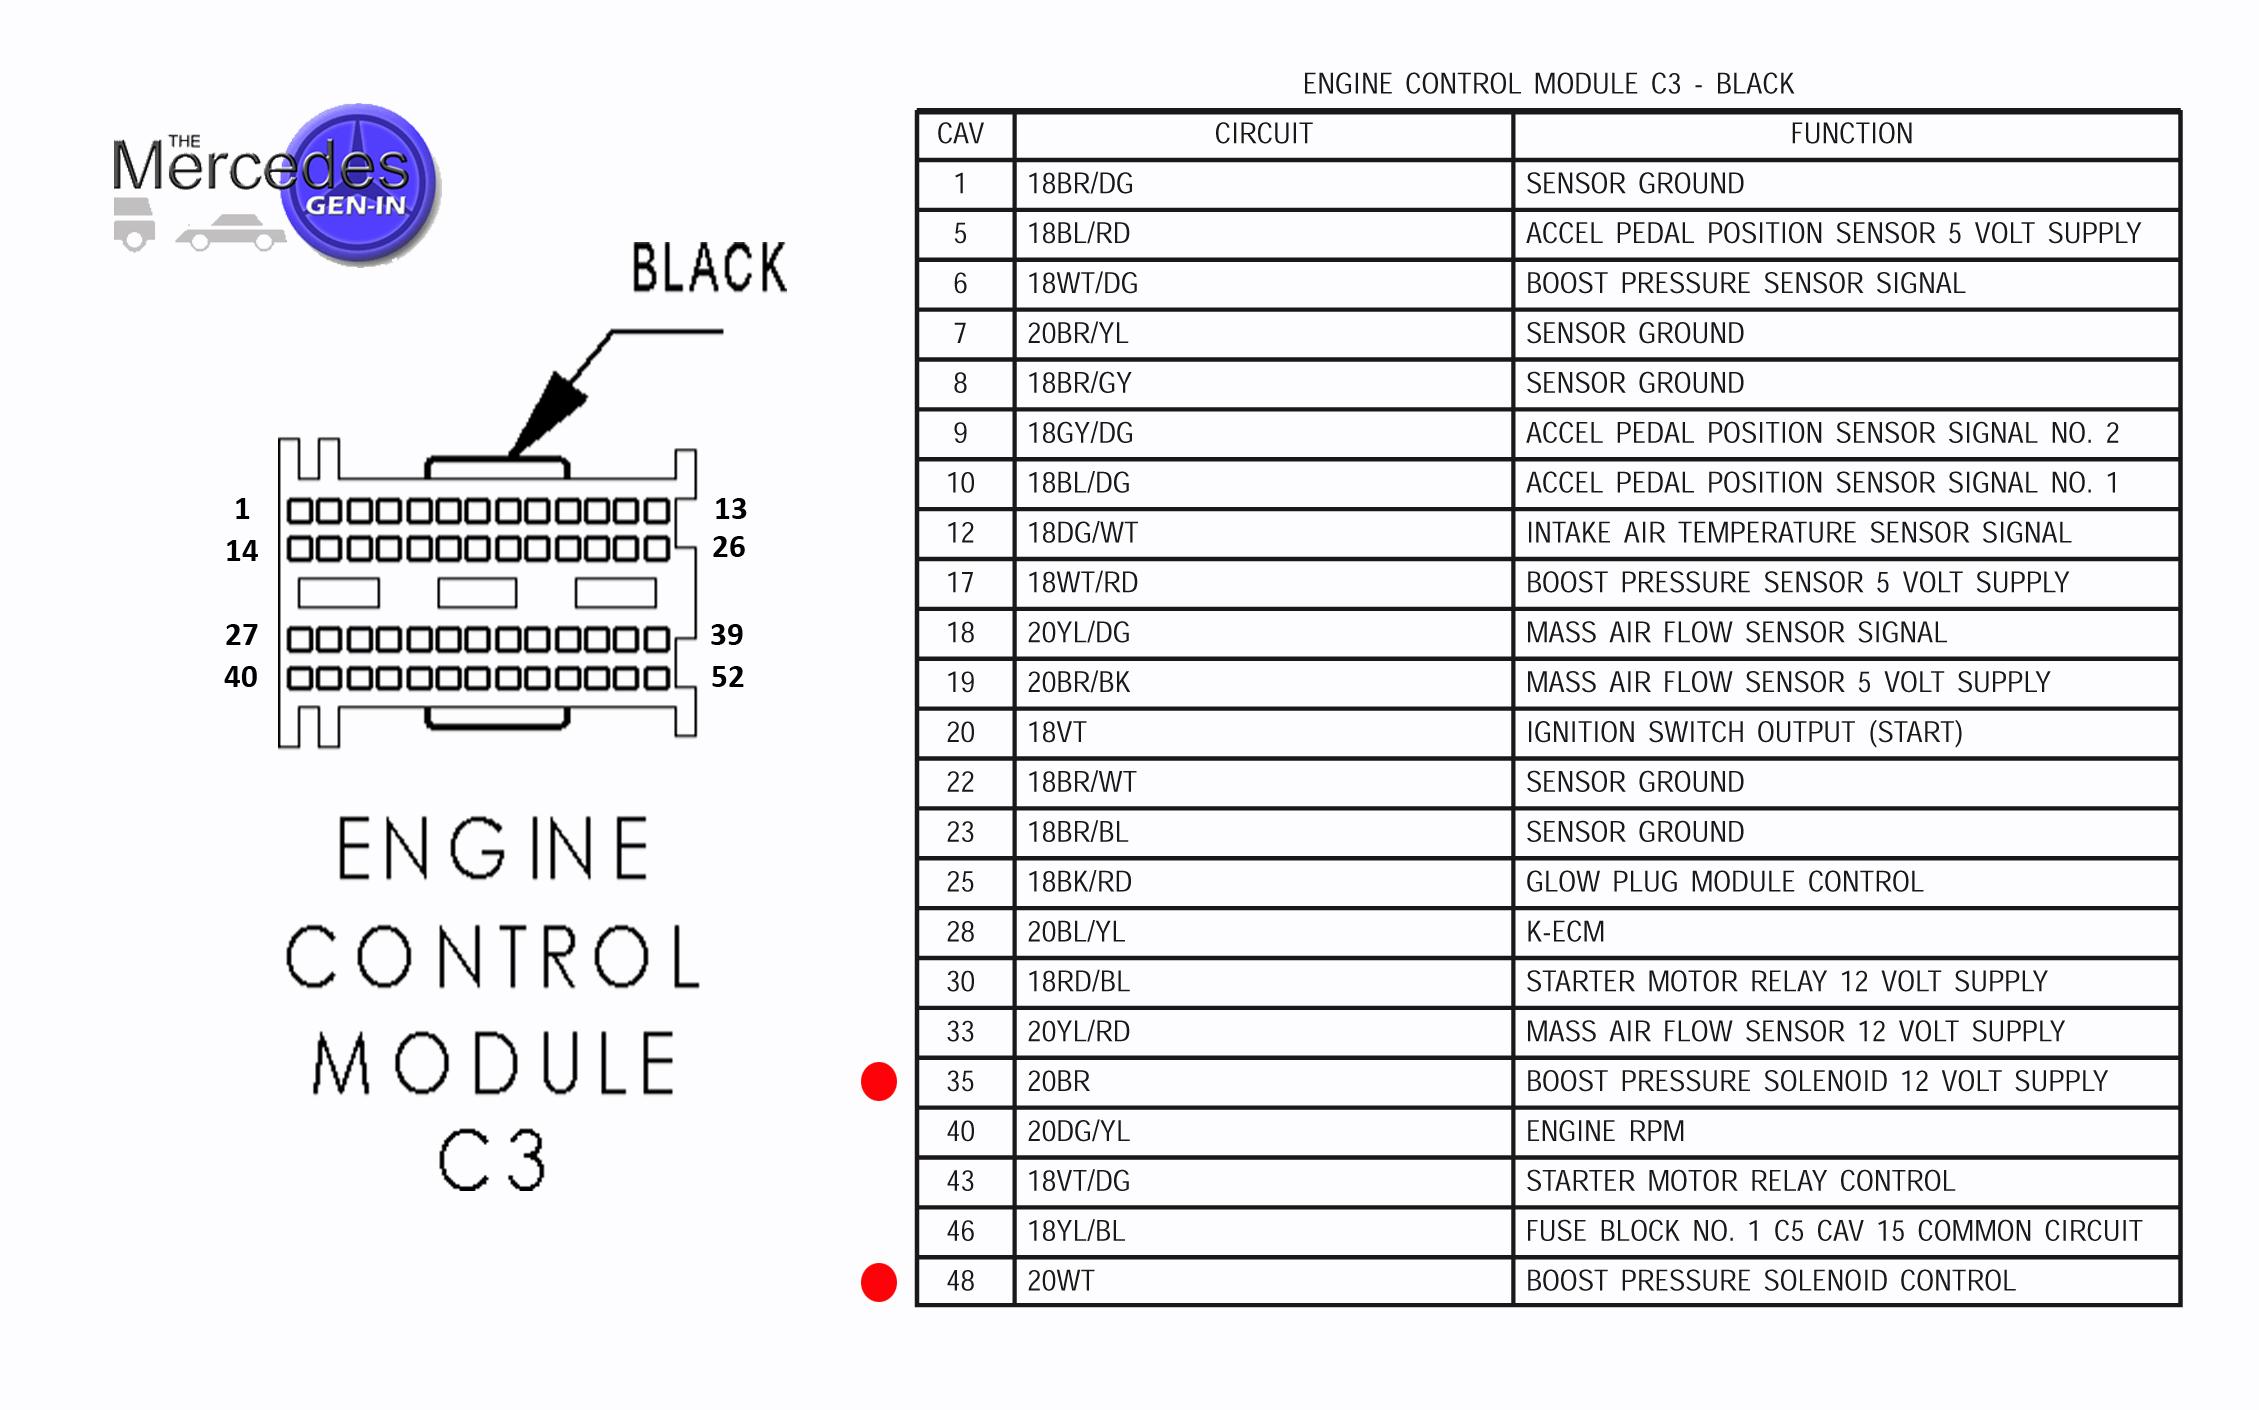 2008 Dodge Sprinter Fuse Diagram Simple Wiring Detailed Gmc Acadia Box Mercedes 2006 Blinker 47 Cadillac Escalade